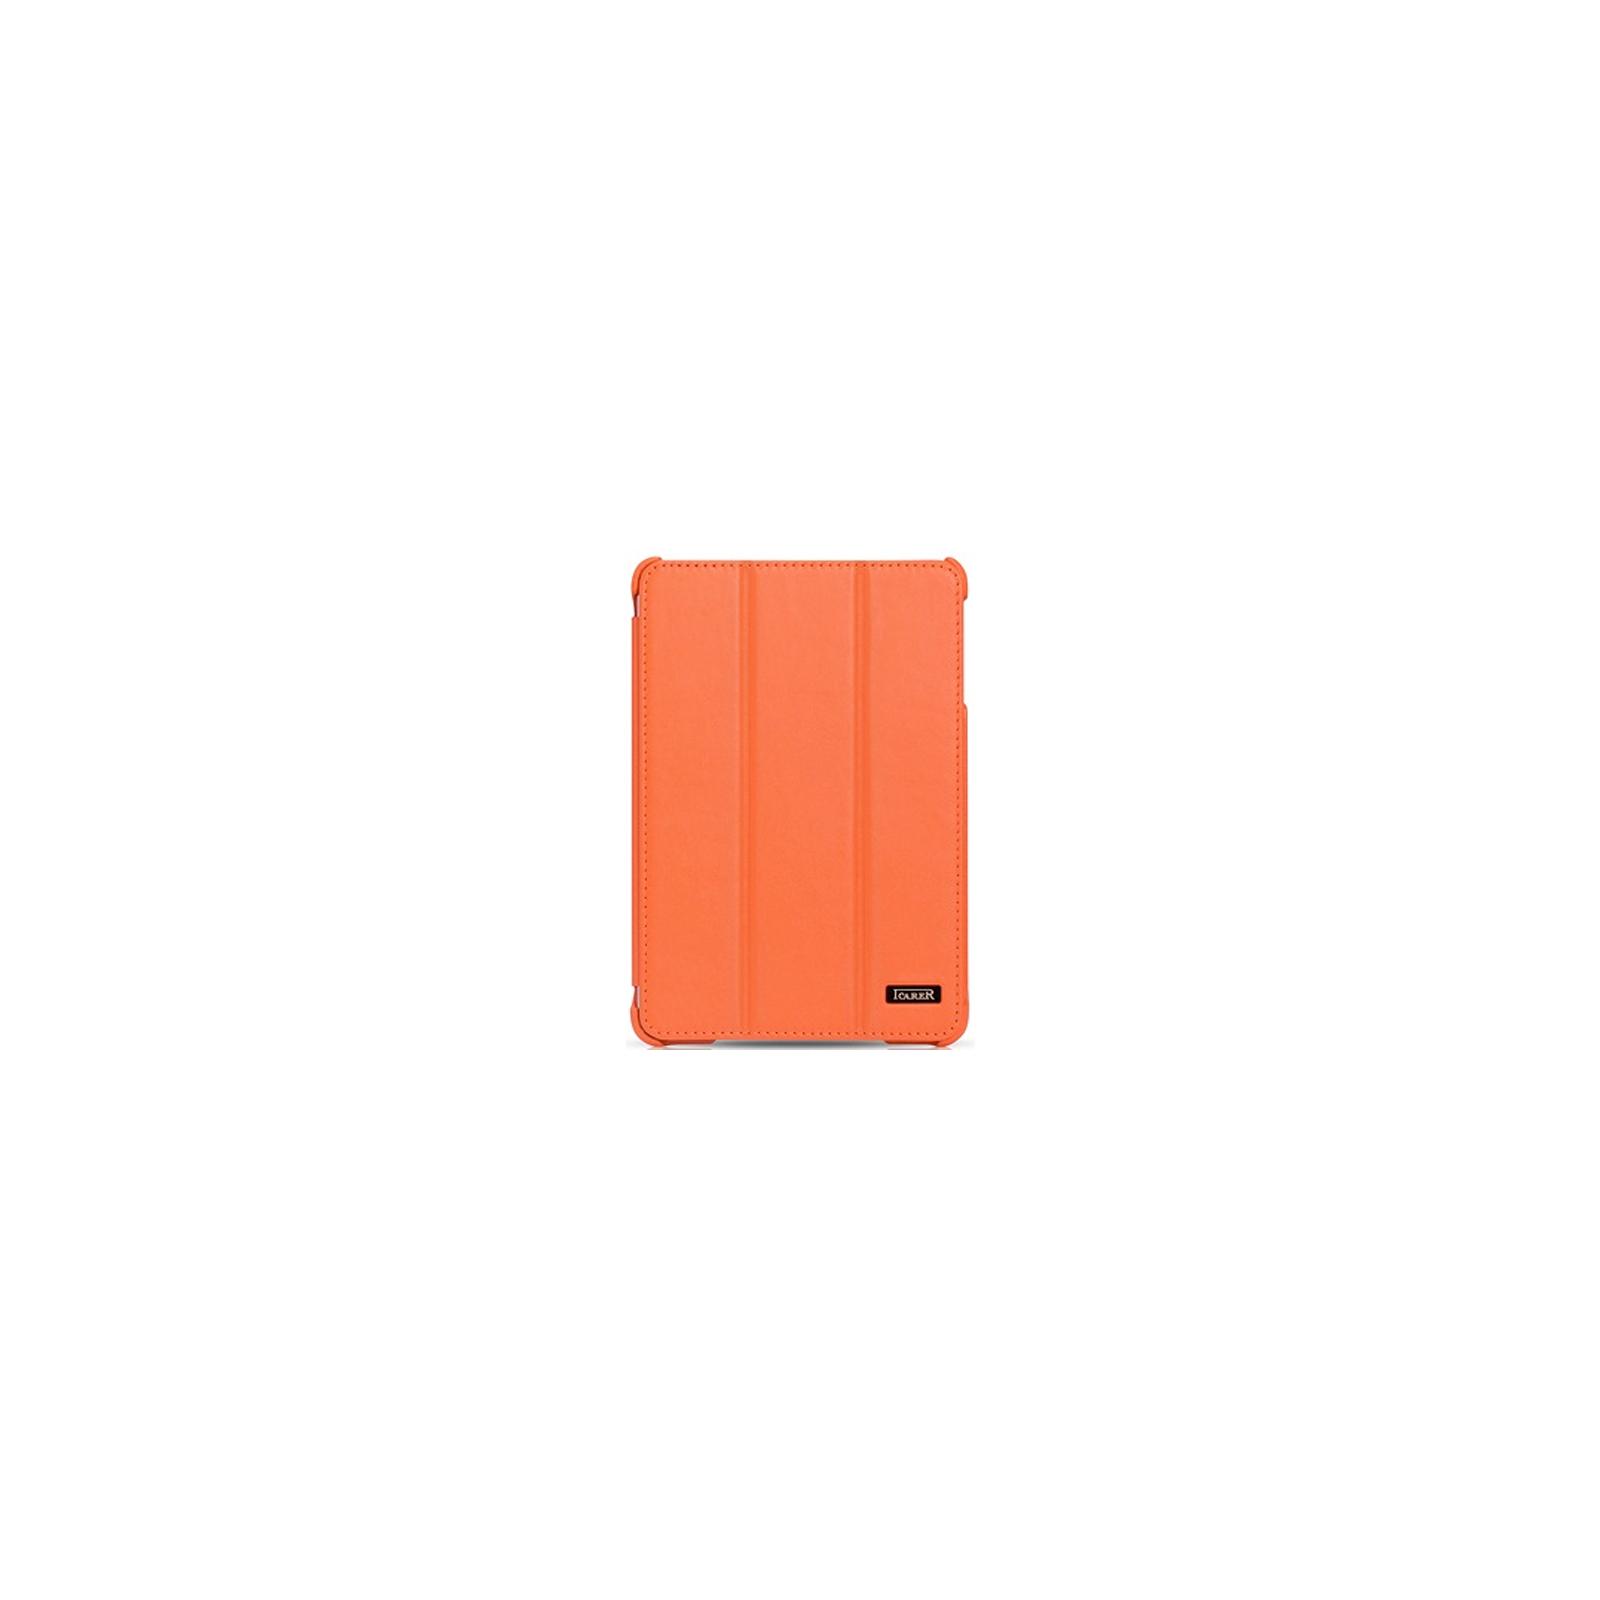 Чехол для планшета i-Carer iPad Mini Retina Ultra thin genuine leather series orange (RID794or)